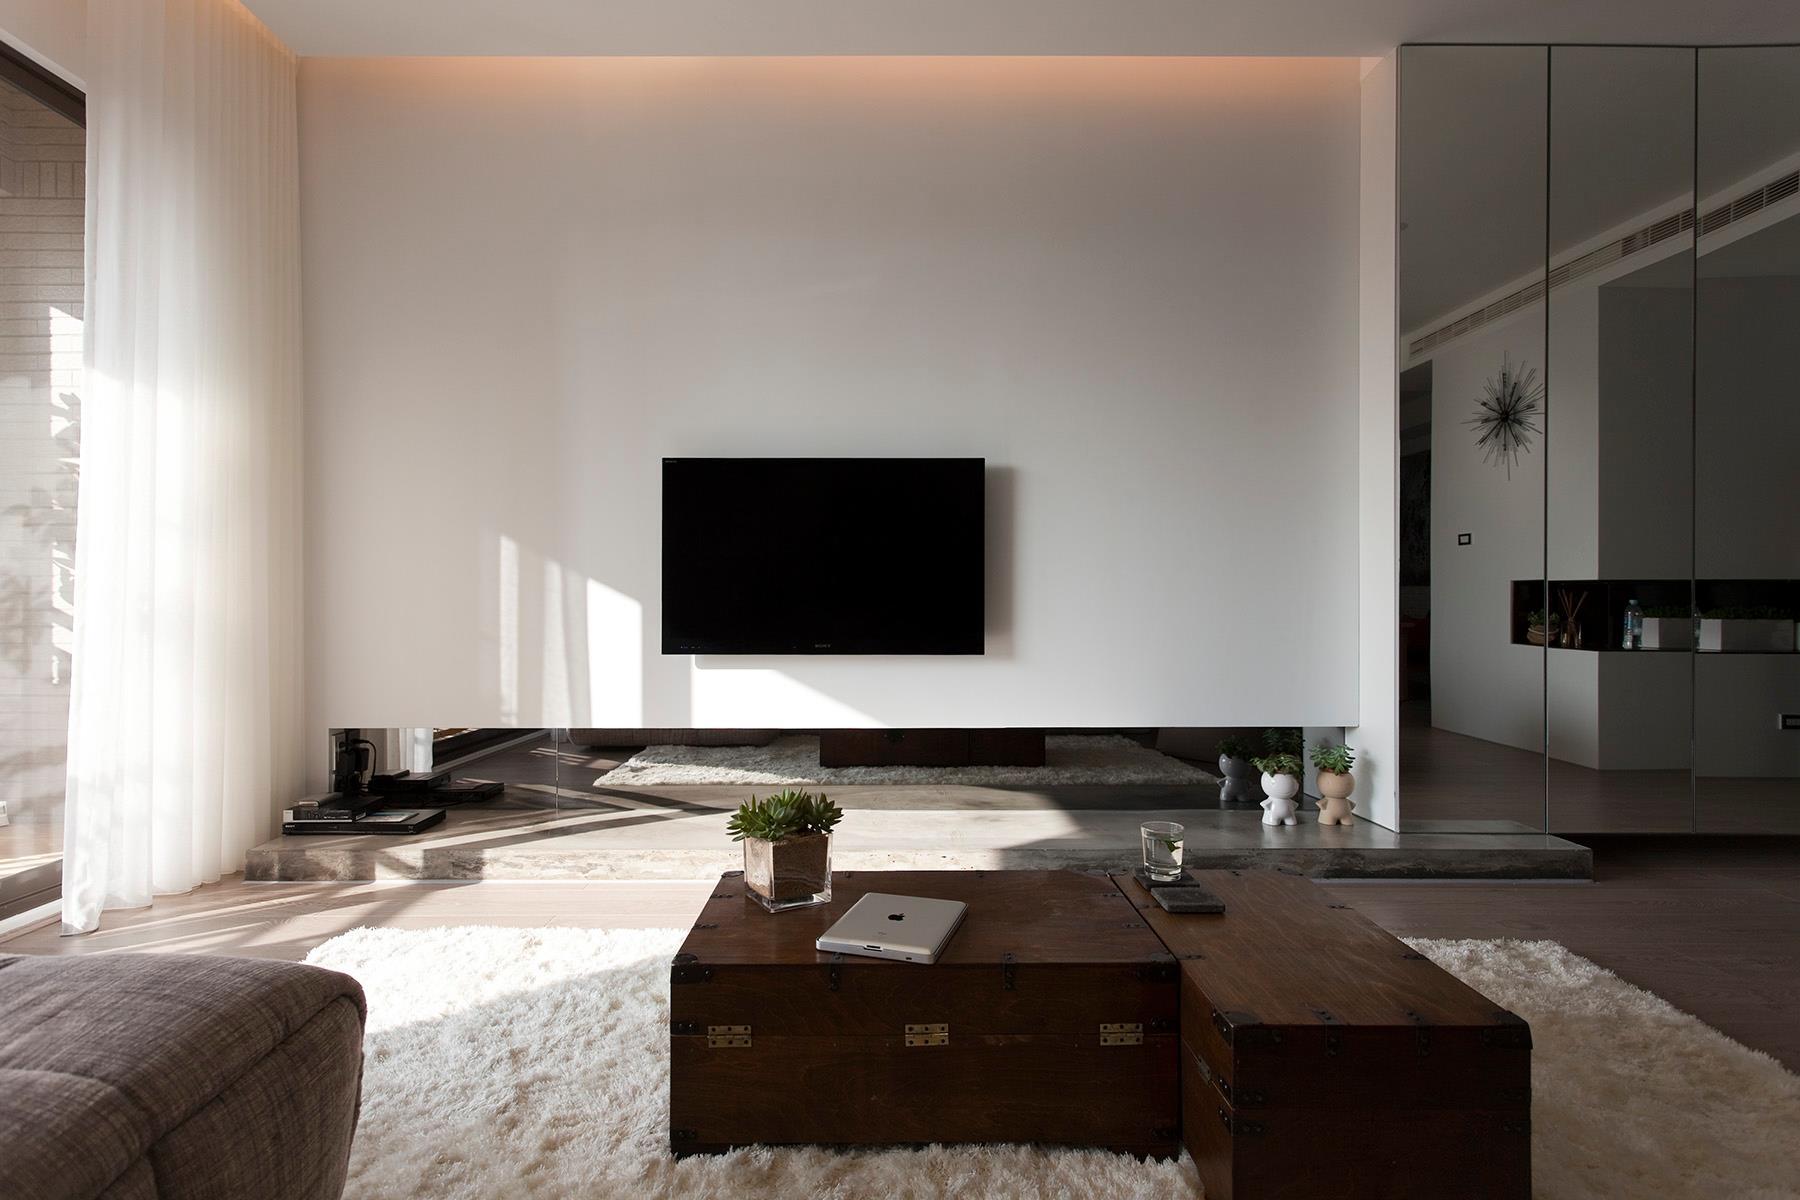 living-modern-amazing-design-on-living-room-design-ideas